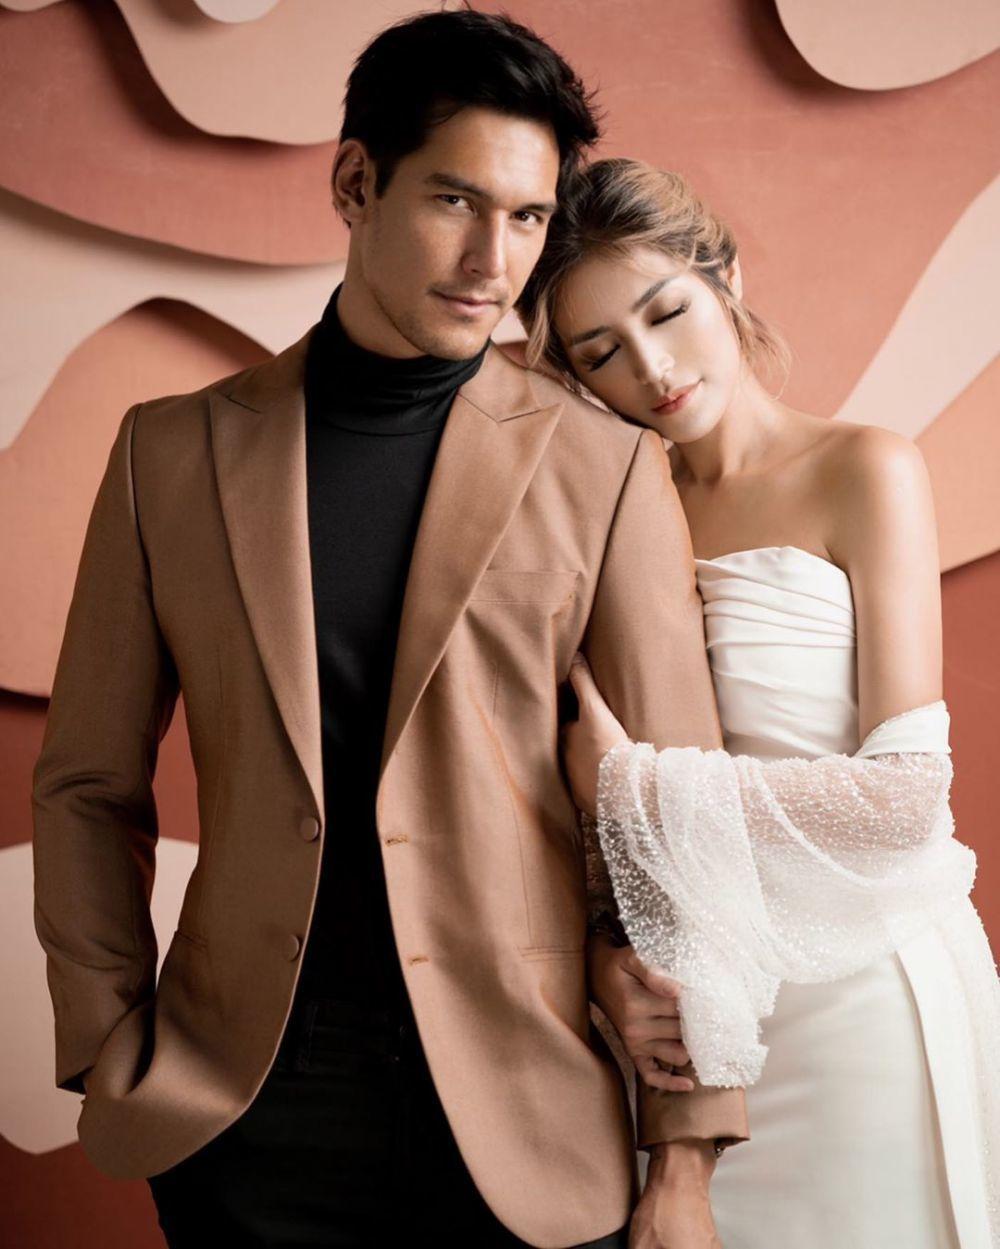 Siap Menikah, Intip 10 Potret Mesra Jessica Iskandar & Richard Kyle